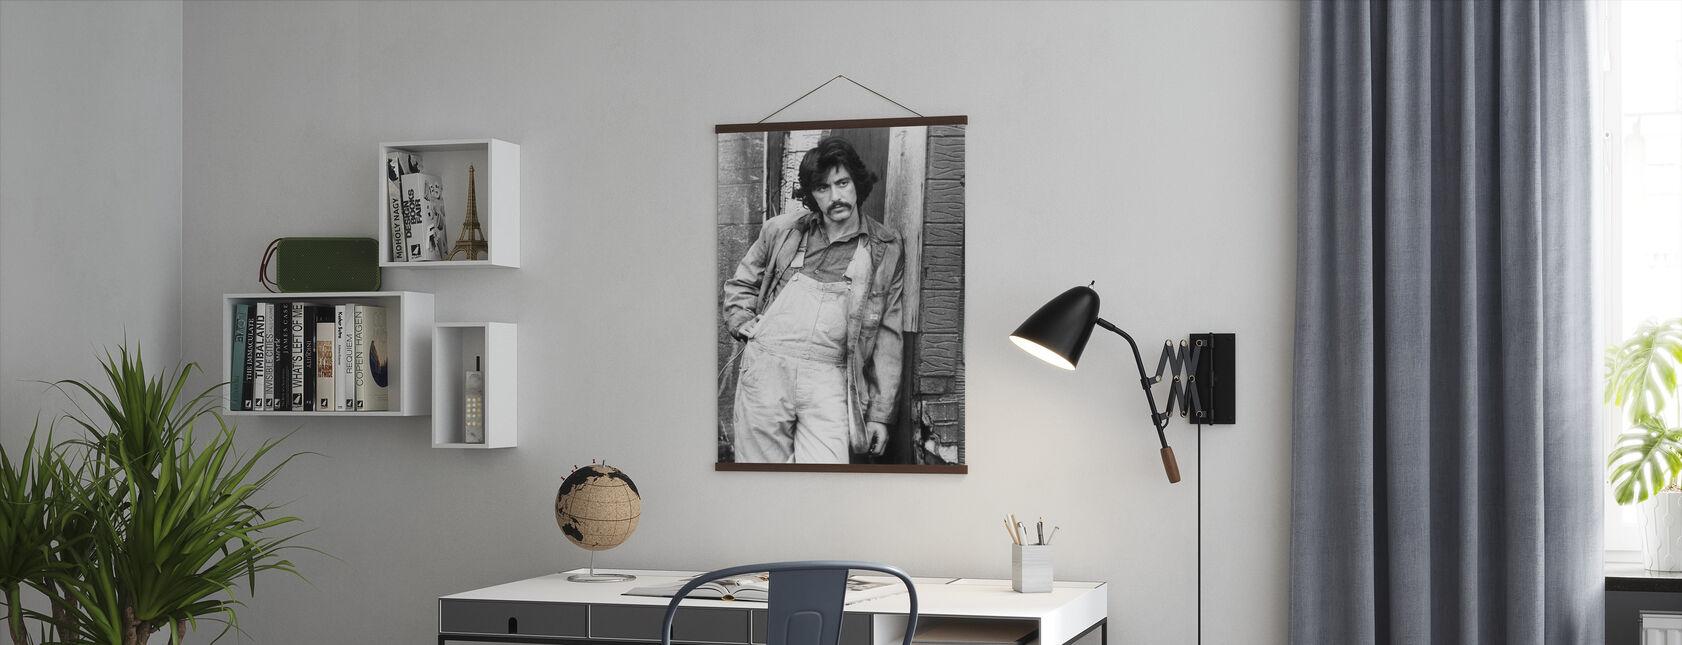 Serpico - Poster - Office